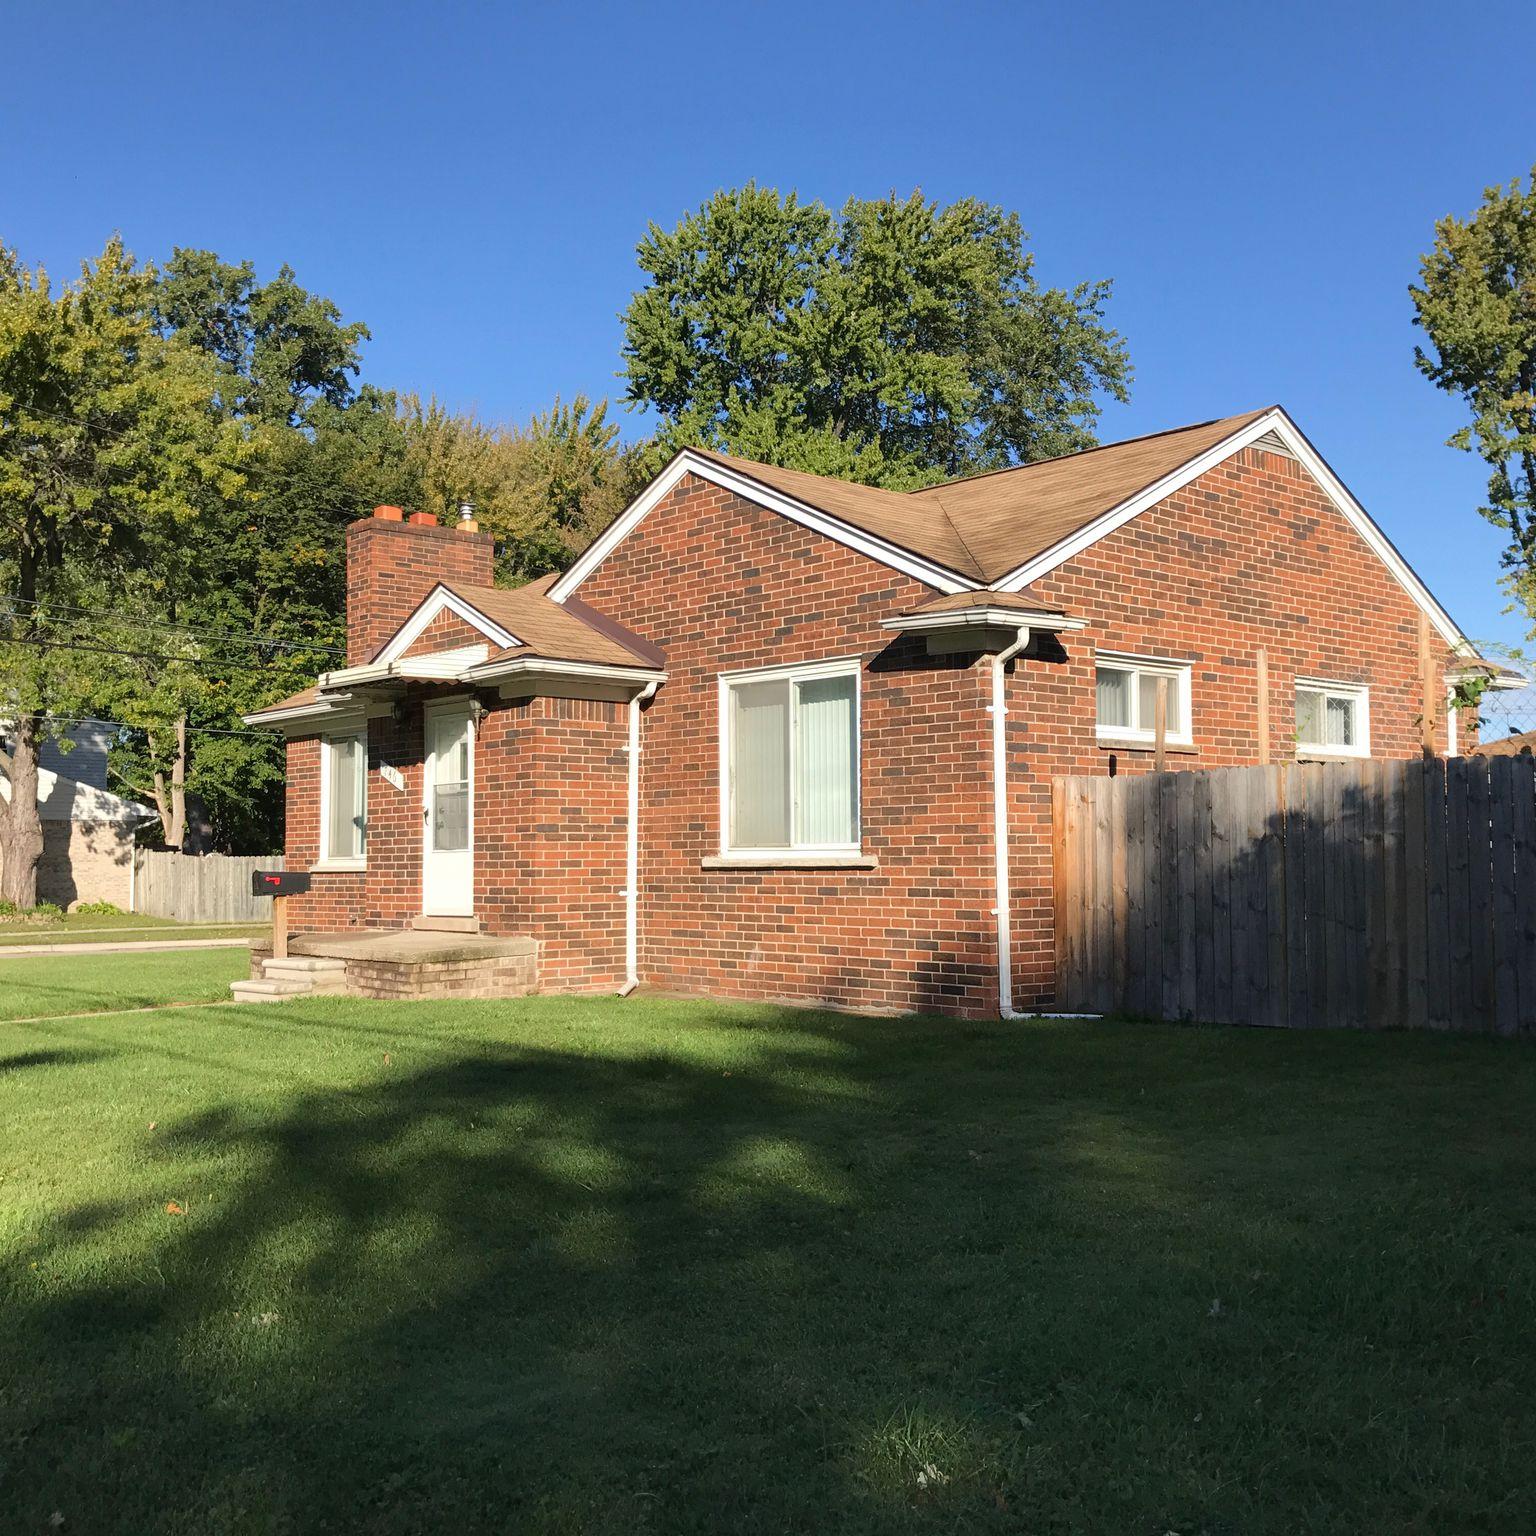 746 park ave royal oak mi 48067 estimate and home details trulia